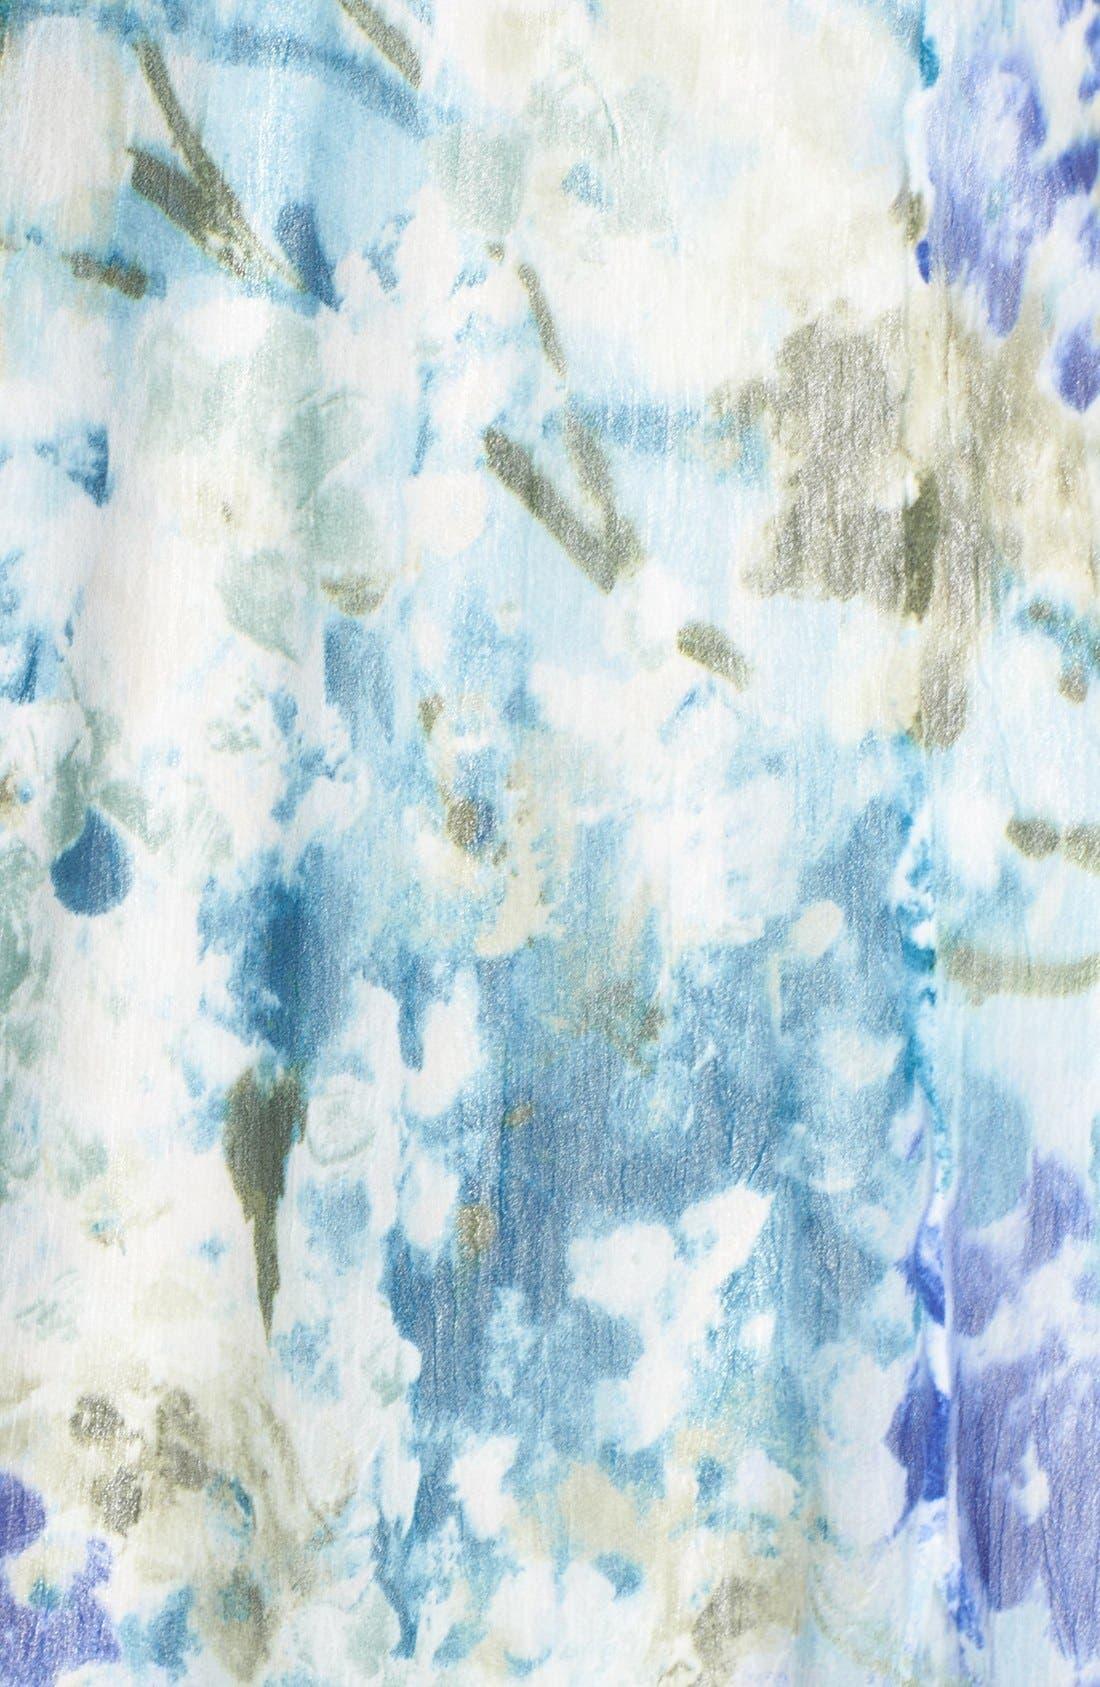 Chiffon A-Line Dress,                             Alternate thumbnail 6, color,                             Monet Dream